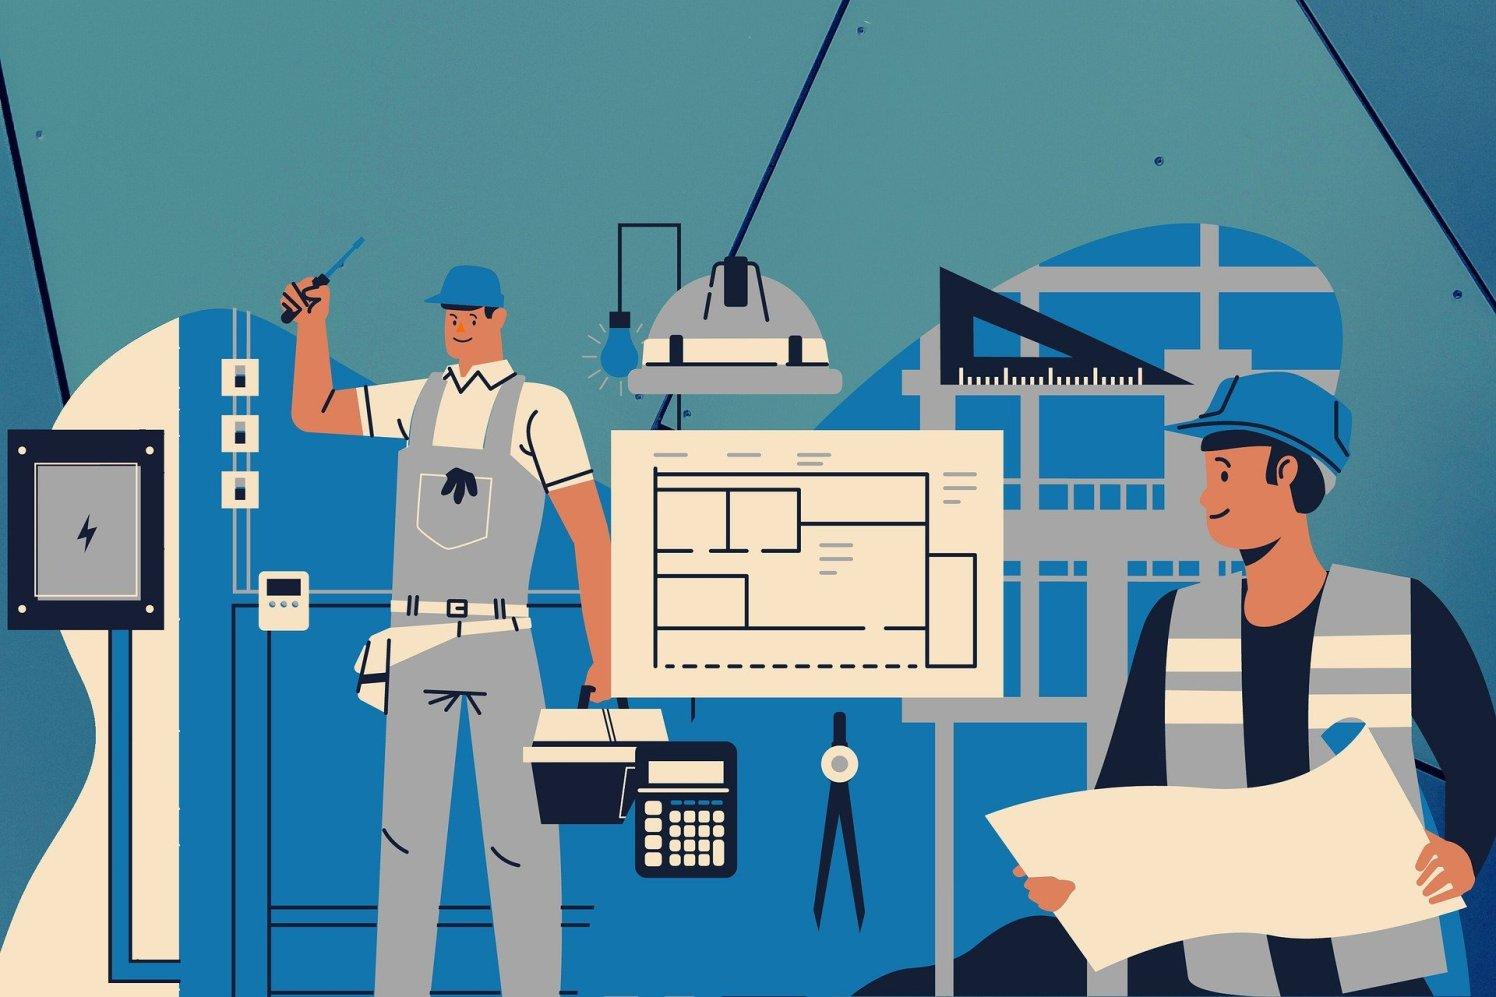 Workforce - image